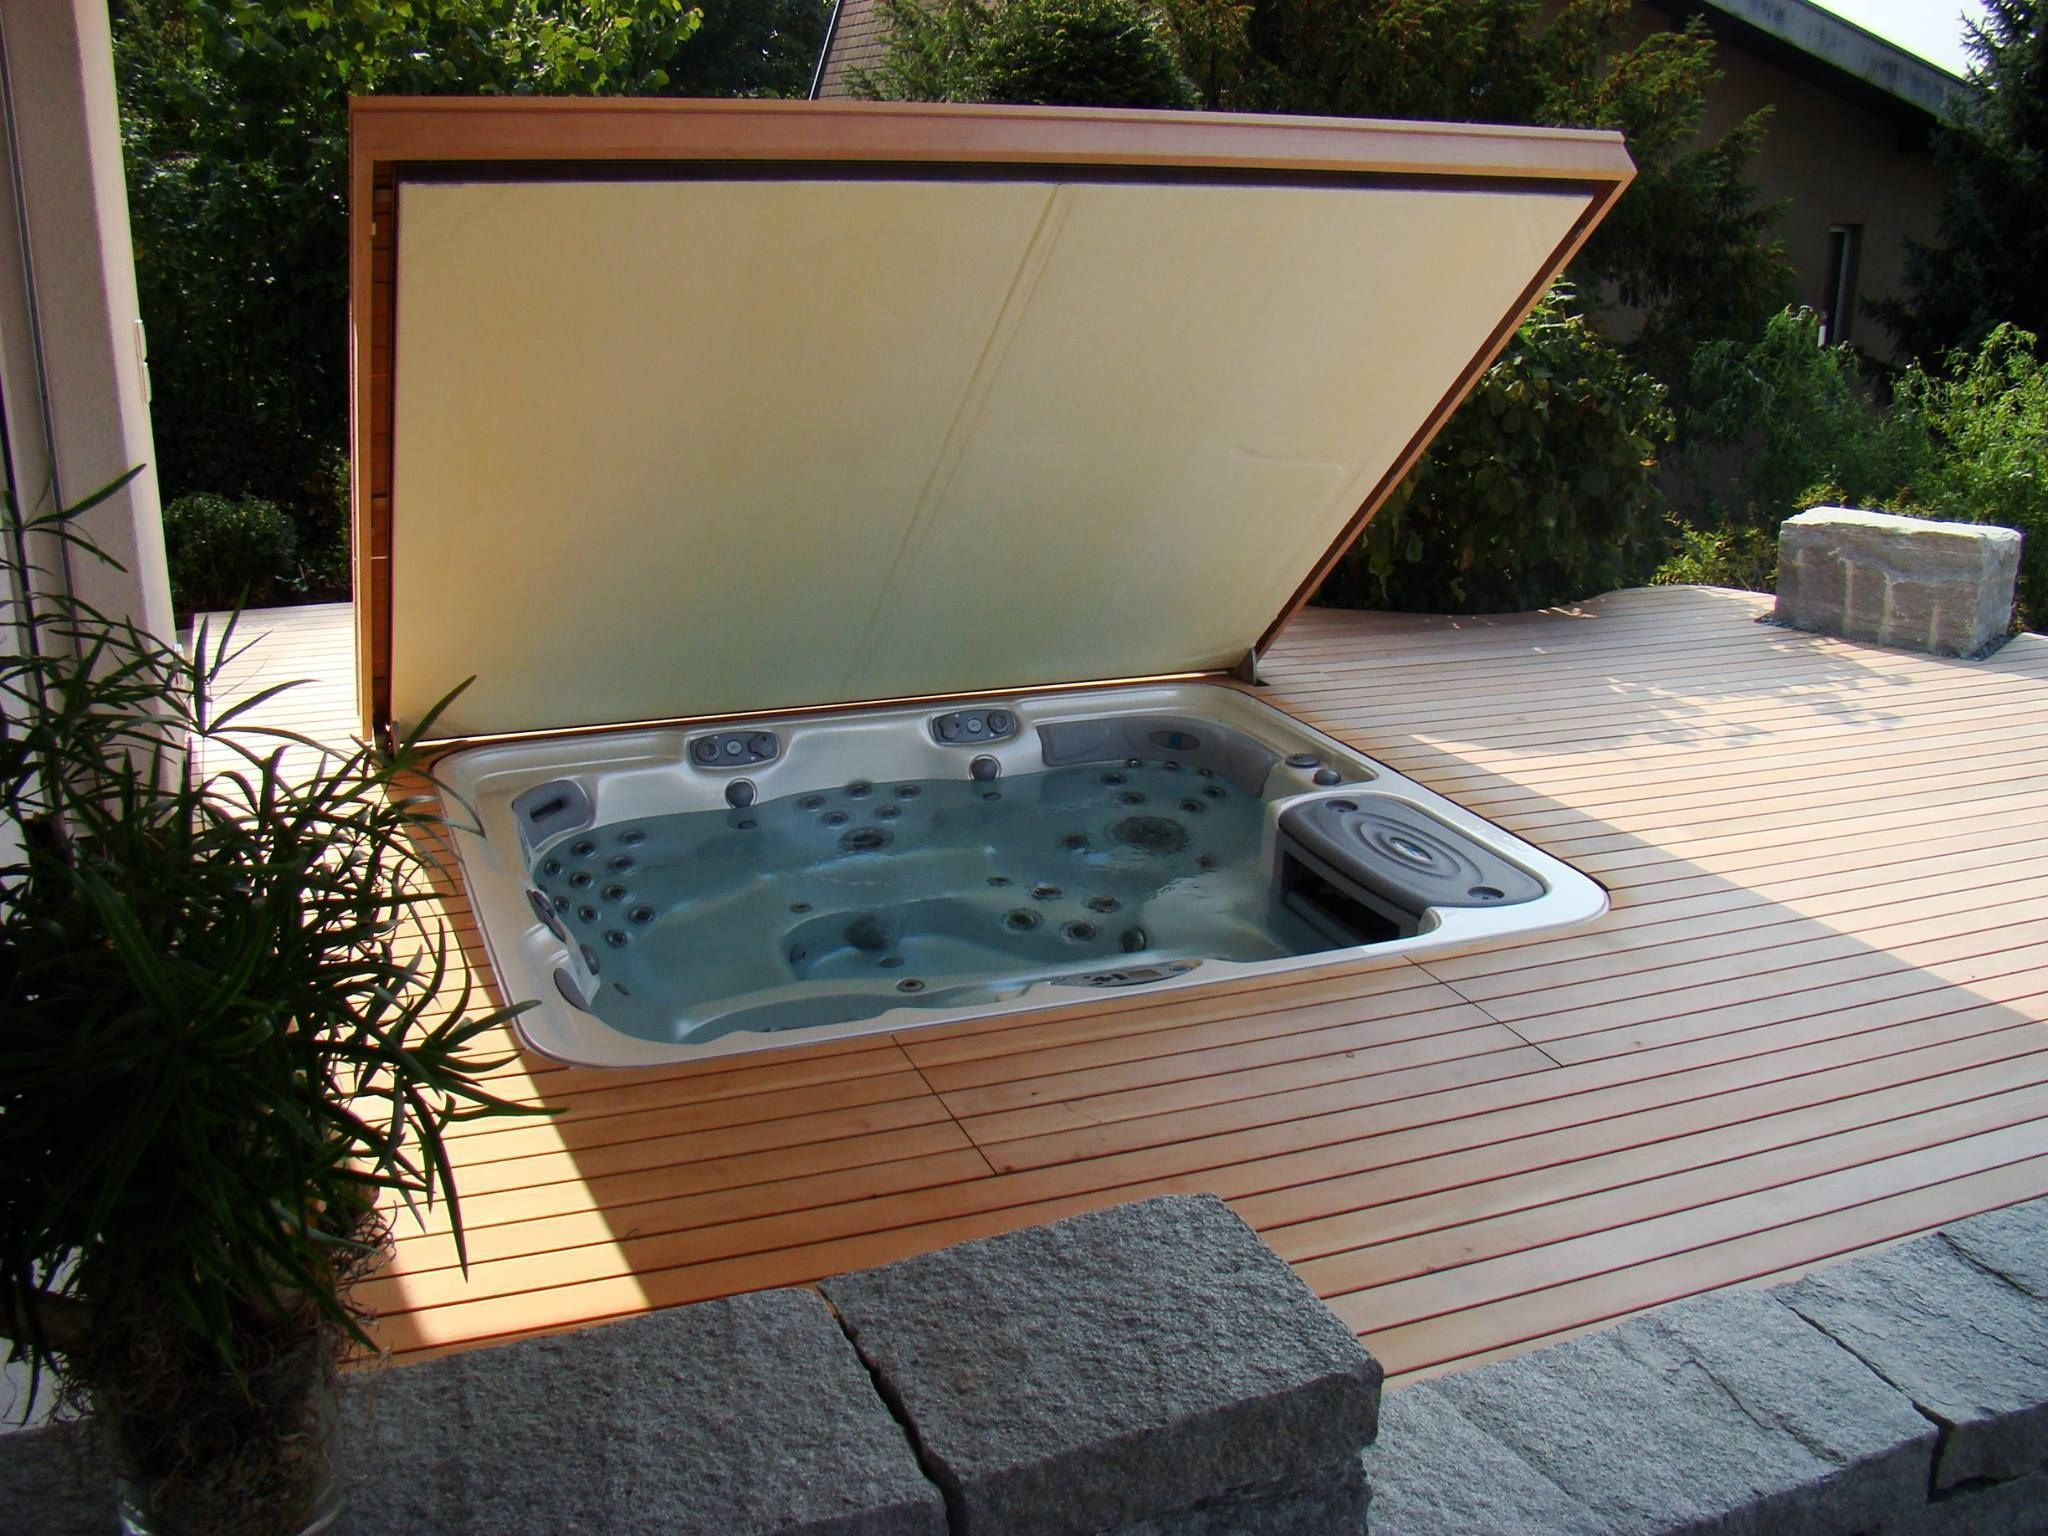 Pin On Bts Hot Hot Tub Deck Hot Tub Cover Whirlpool Hot Tub